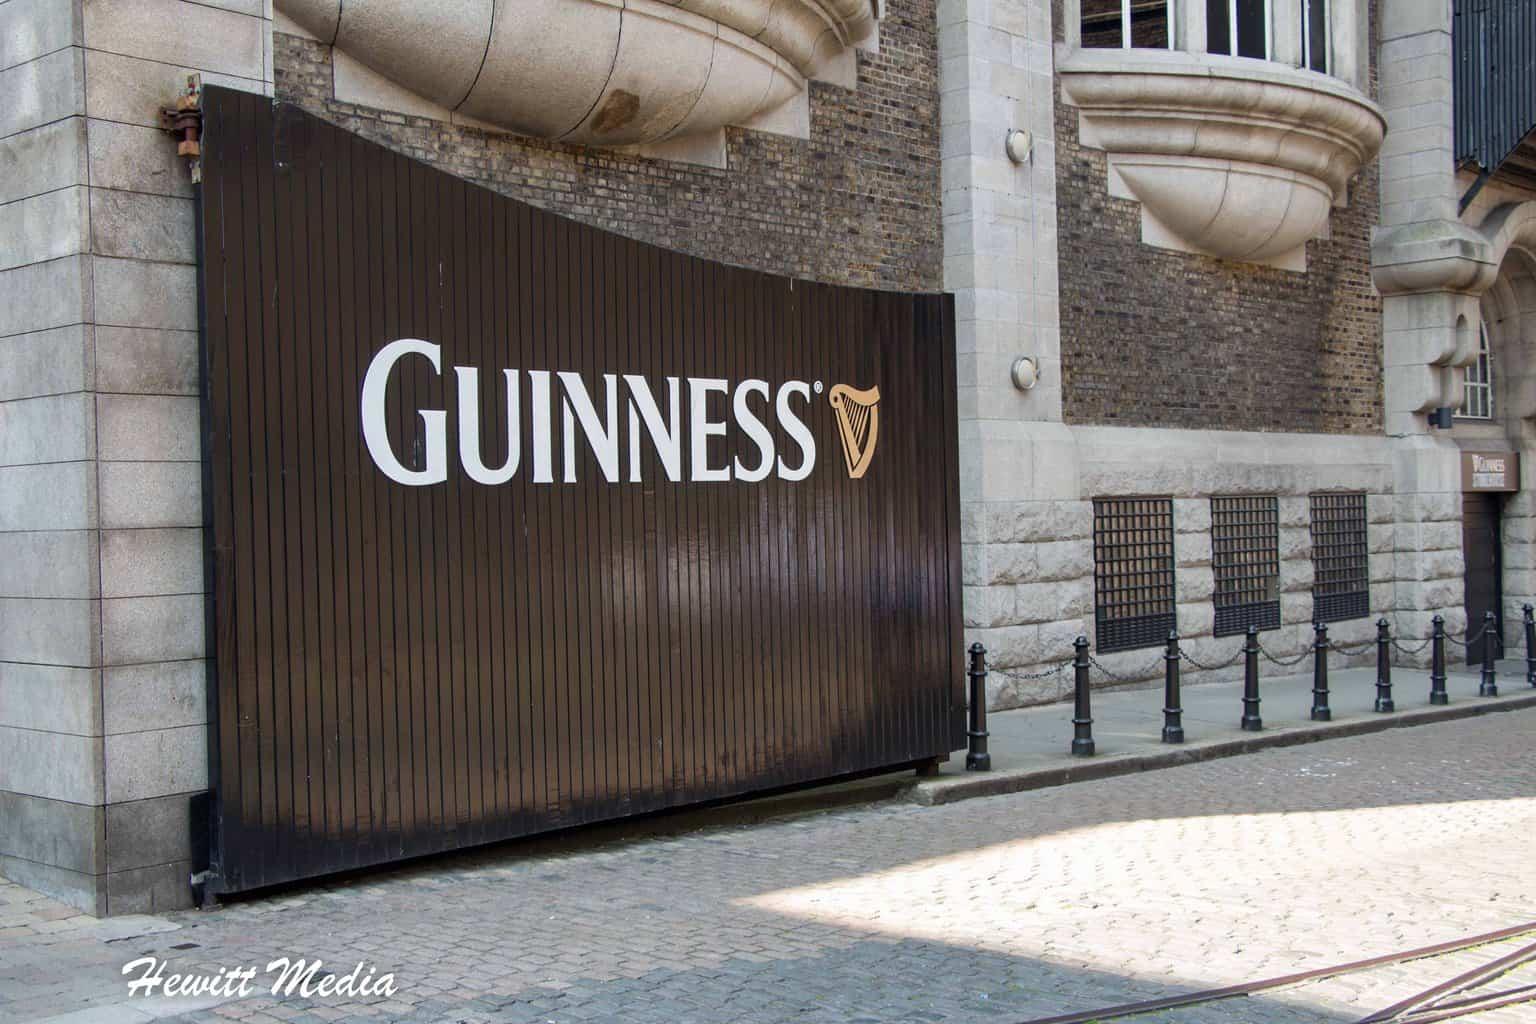 Best World Festivals - Dublin Ireland Saint Patrick's Day